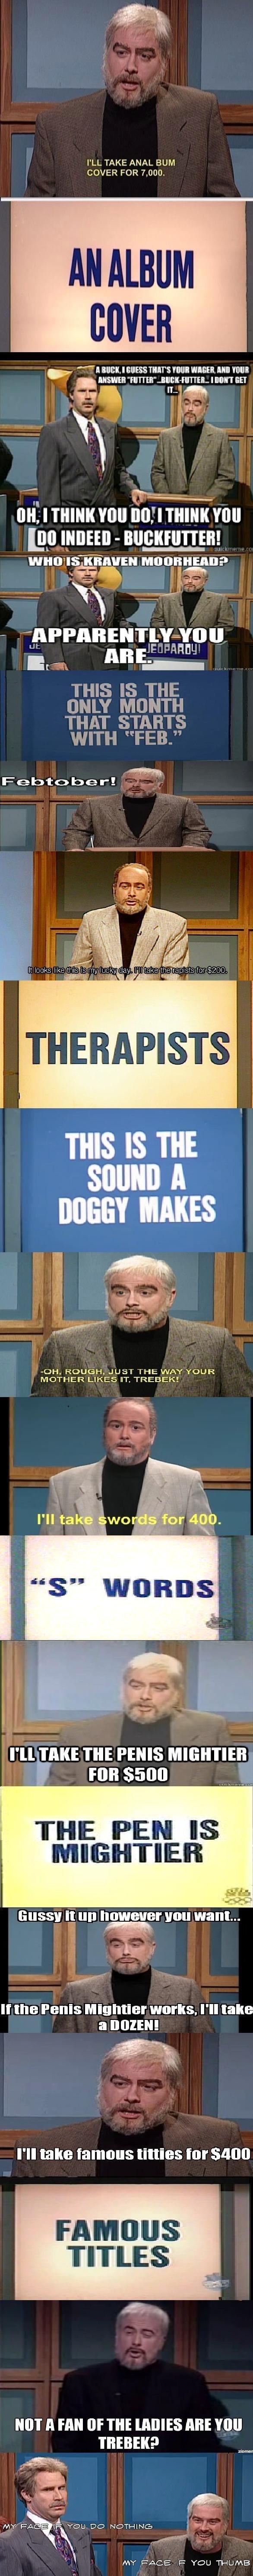 SNL Sean Connery. . I' LL TAKE ANAL BUM COVER FOR 7, 000. v 'T'! BUCK] MESS CQW' S mun WIGHT Mu] WIN! teii', miight mu mu Tle THIS It THE MEET MAKES OH. ROUGH.